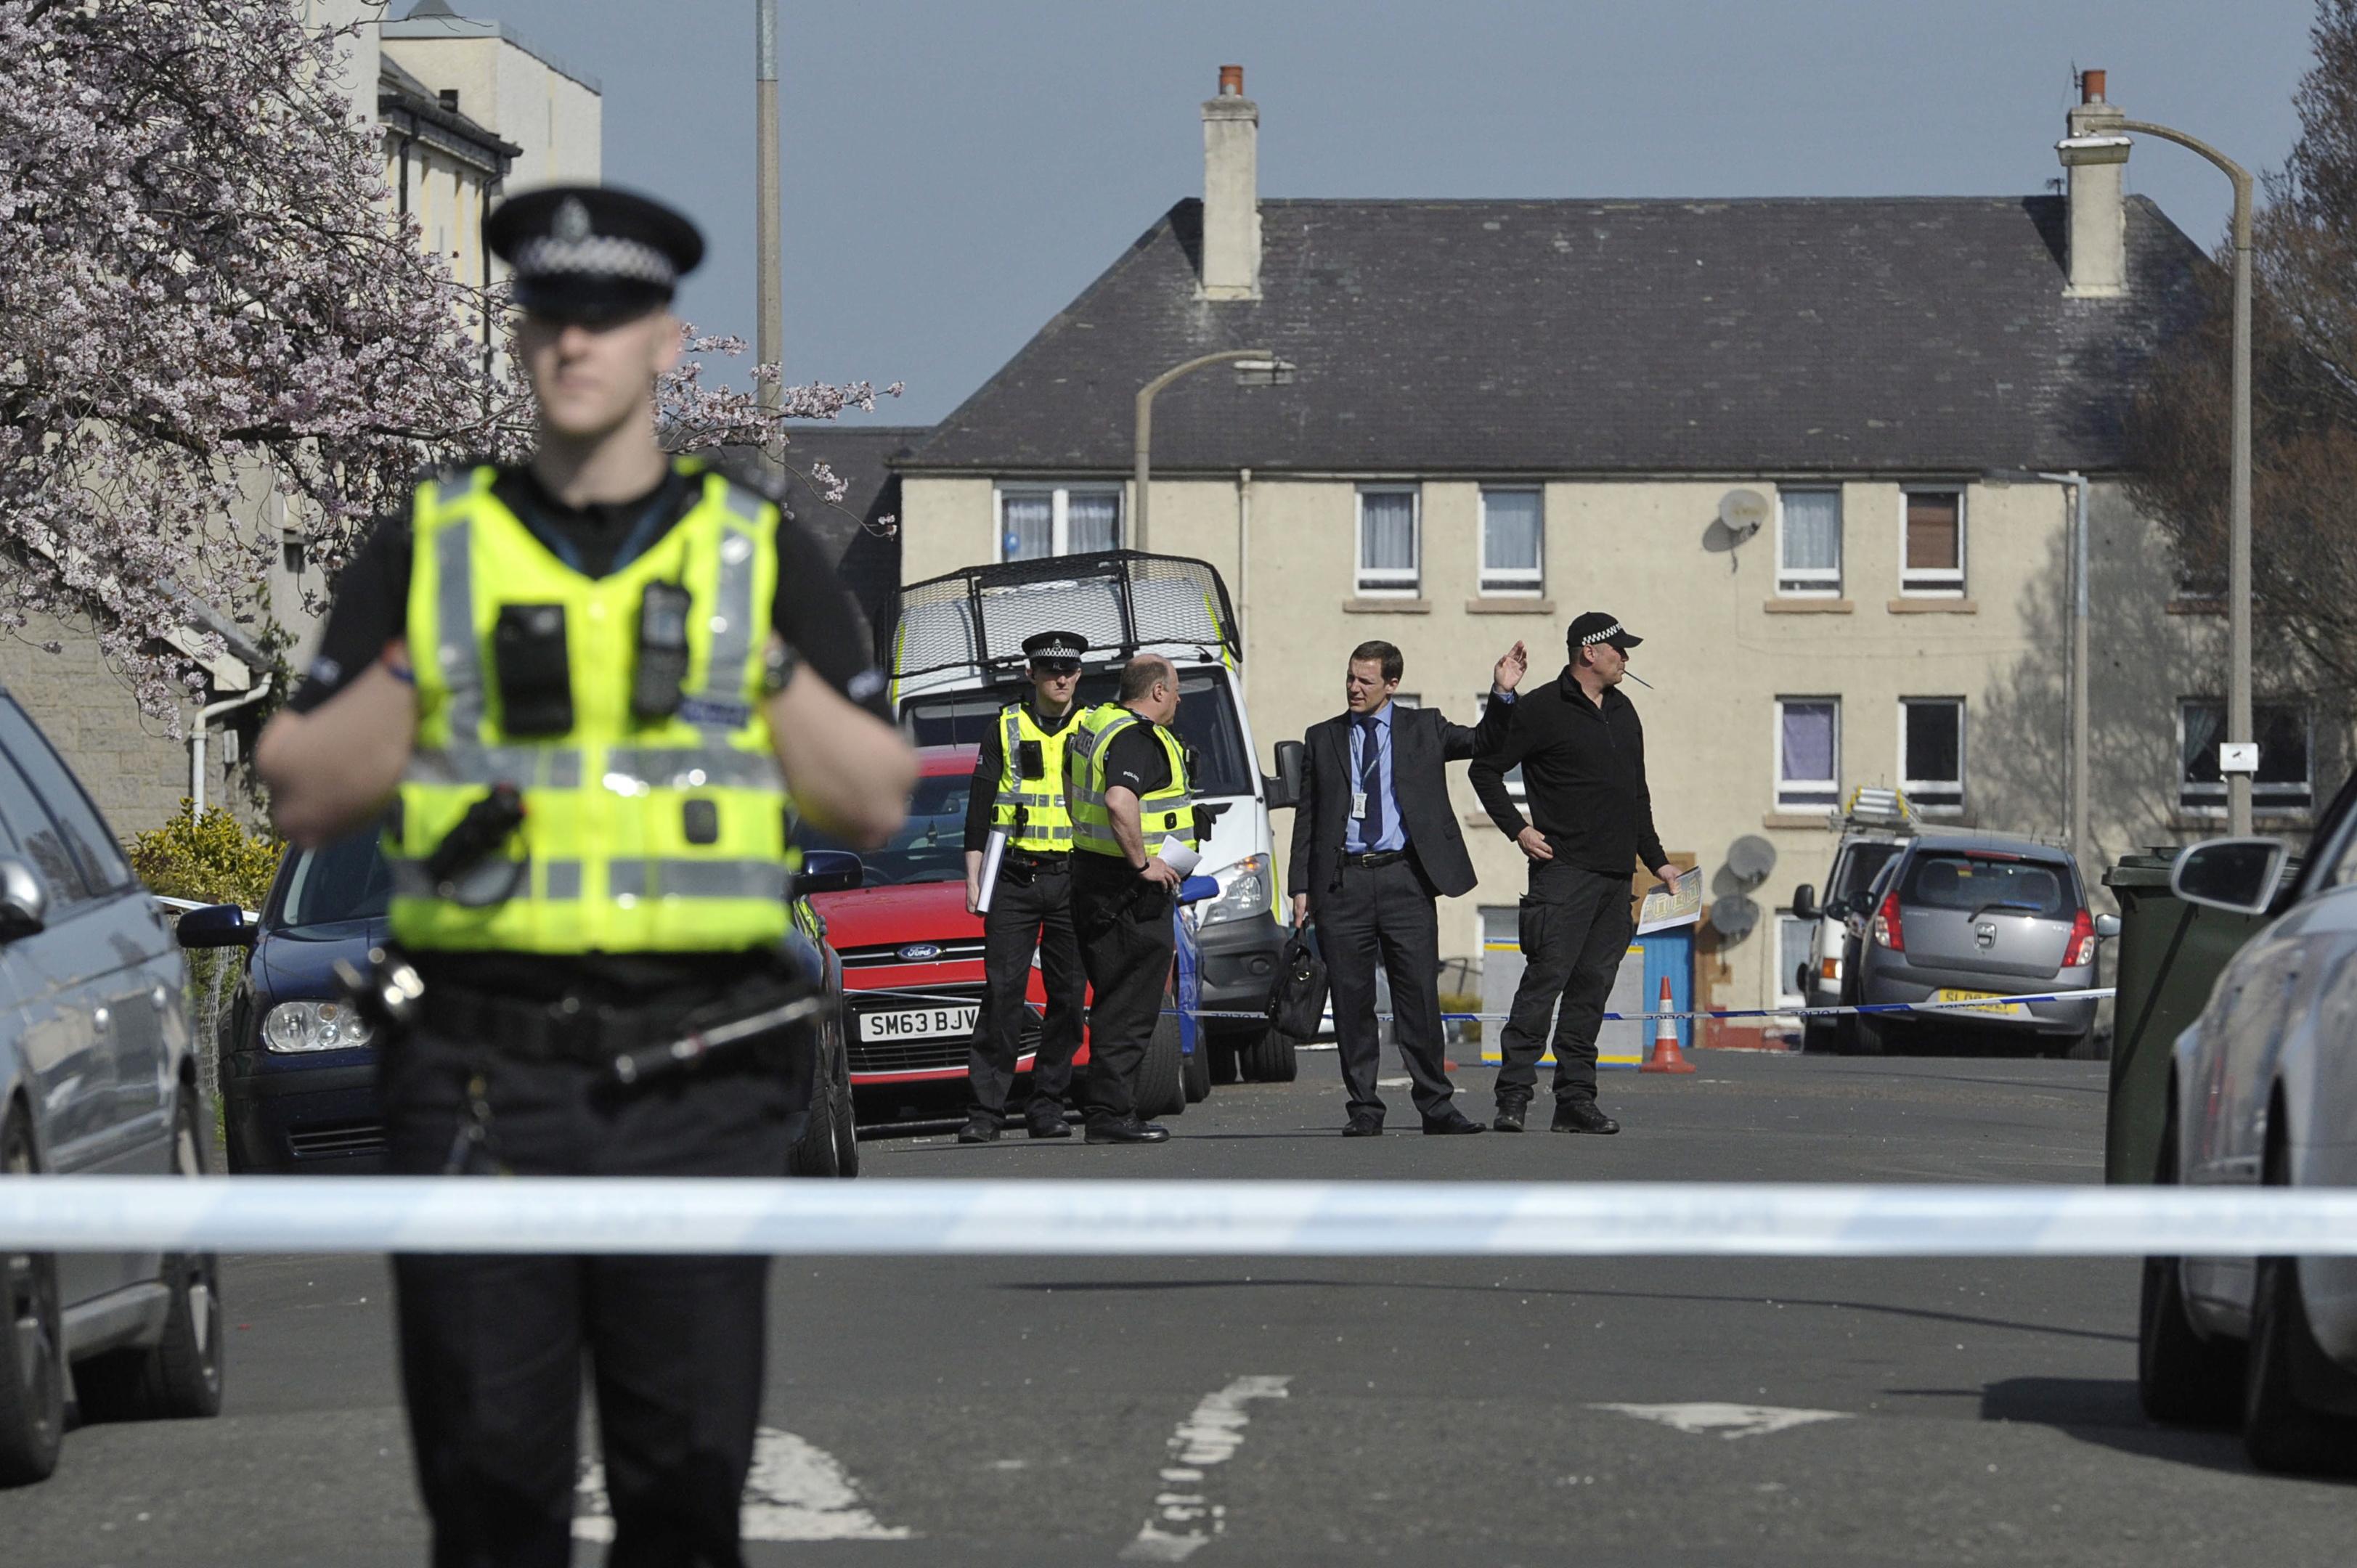 Police at the scene of the incident in Edinburgh's Wardieburn area.